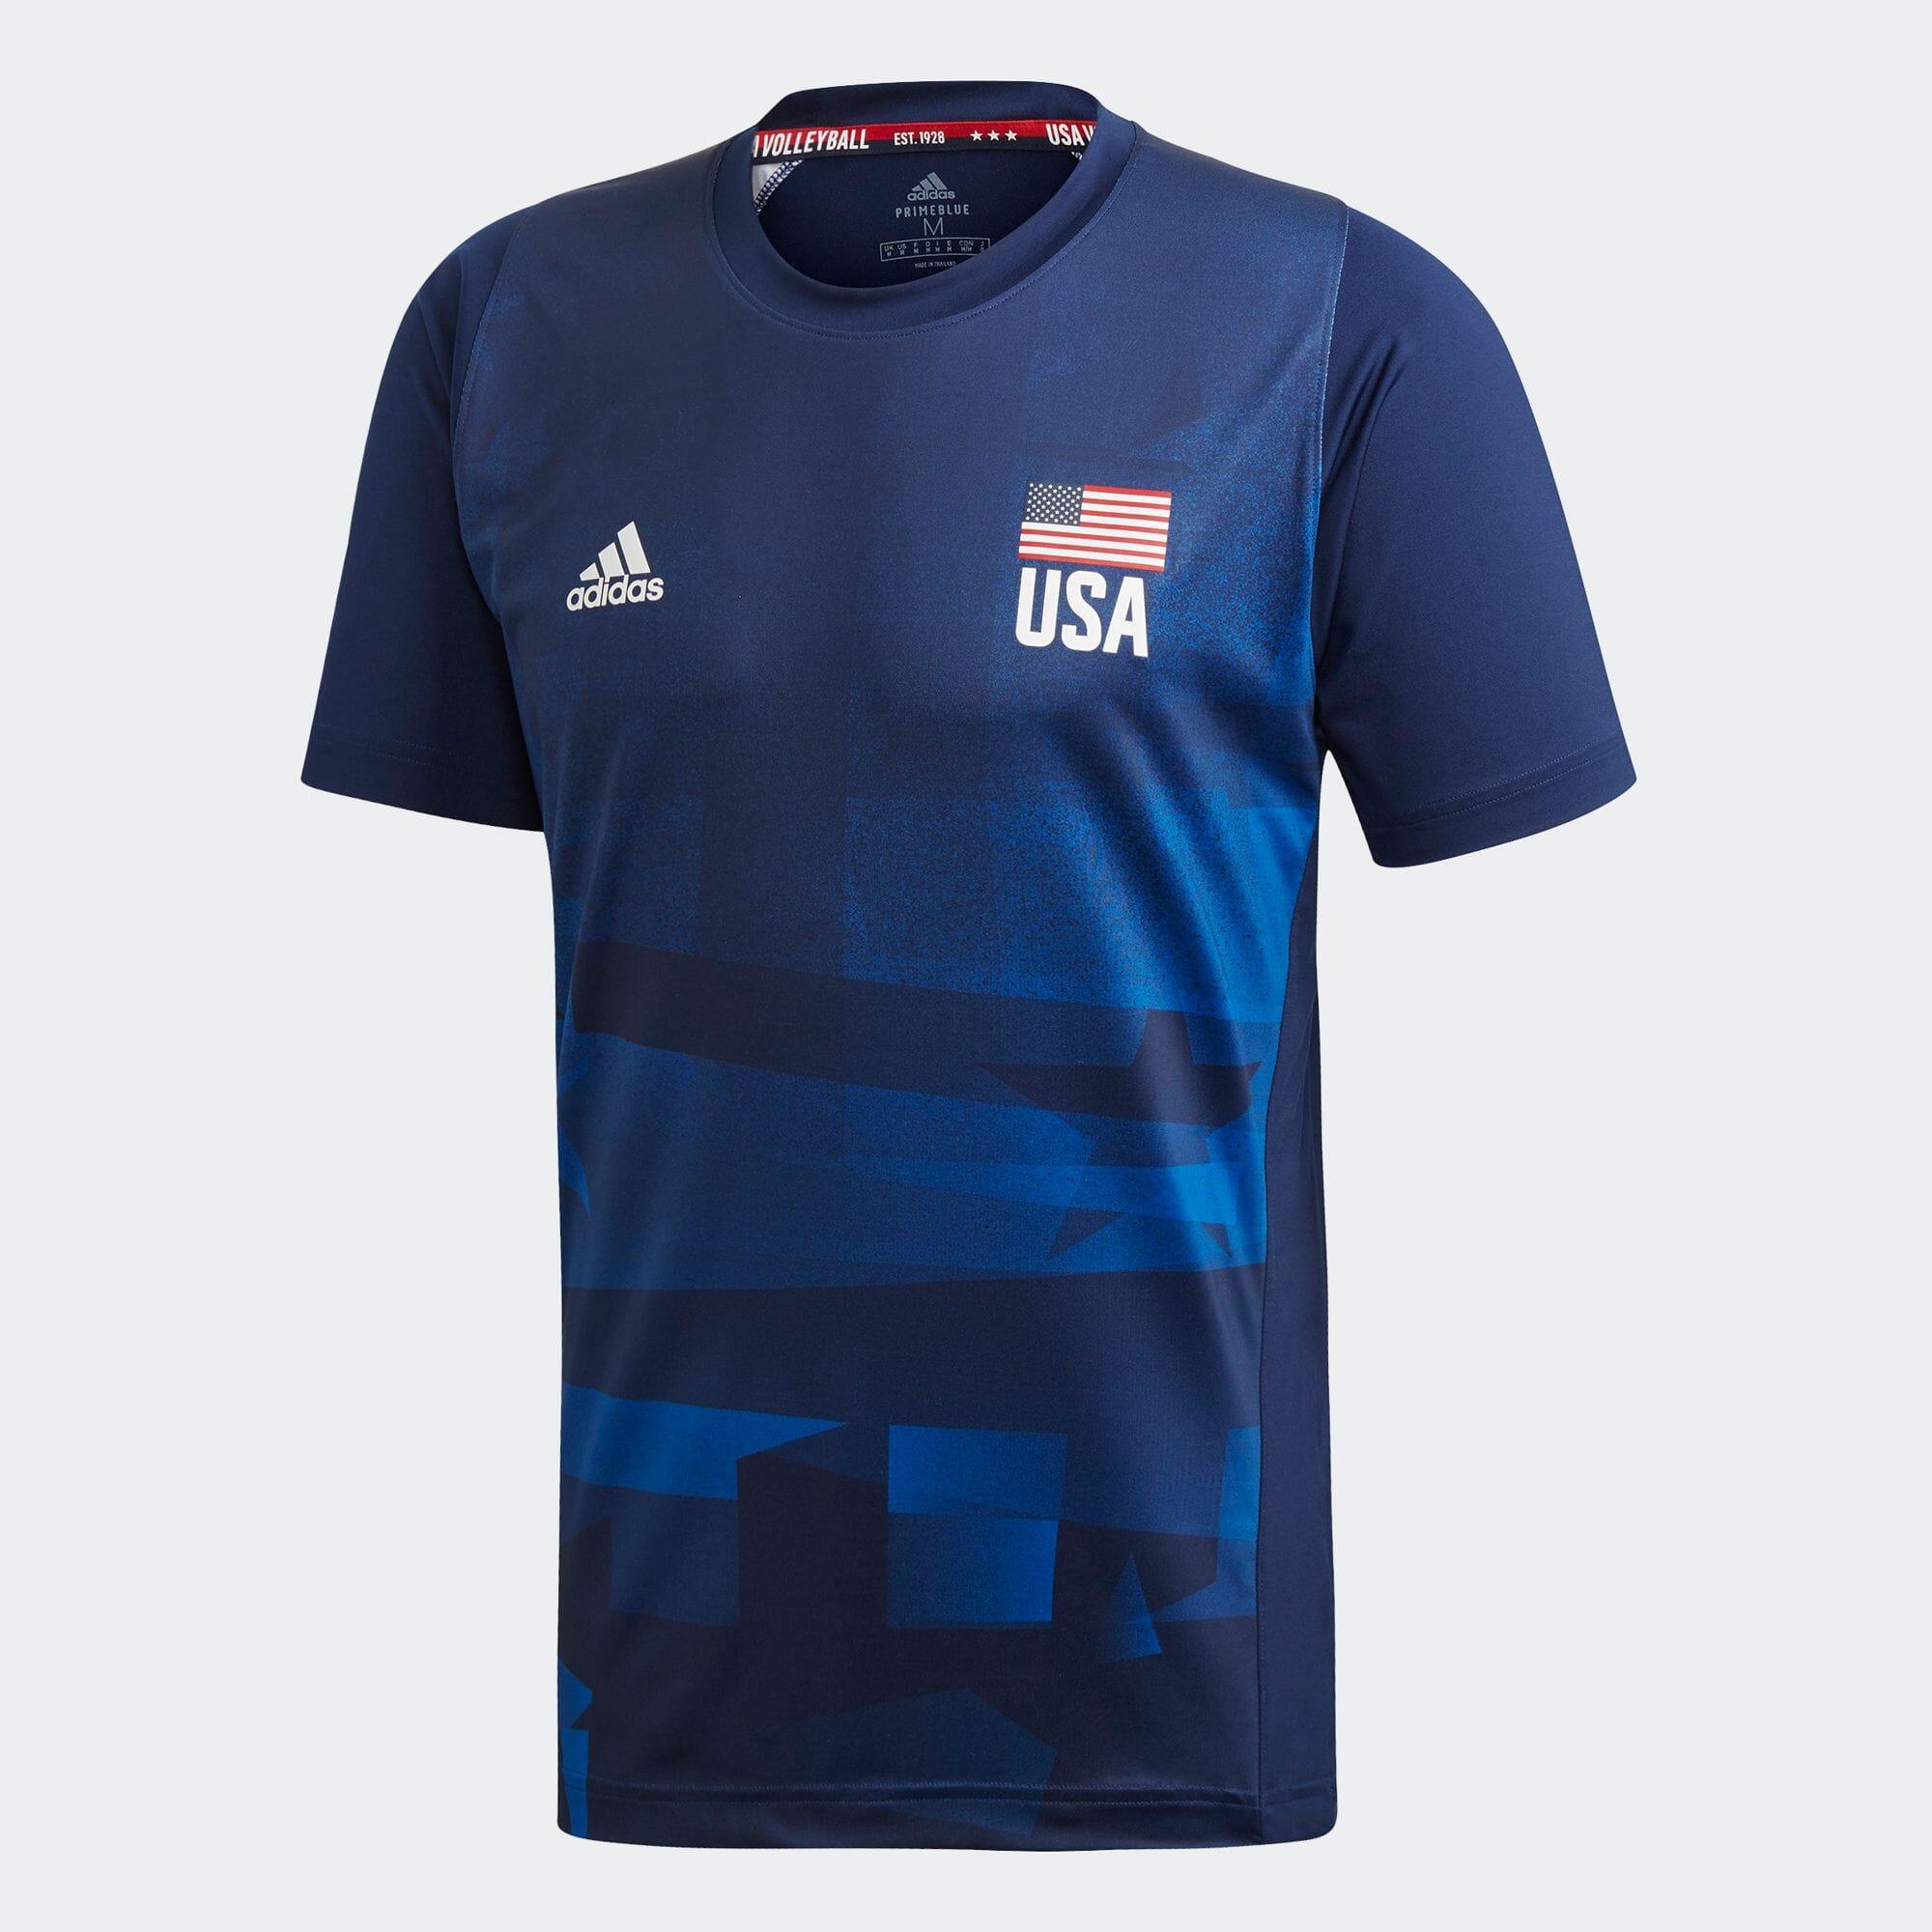 USA バレーボール PRIMEBLUE レプリカTシャツ / USA Volleyball Primeblue Replica Tee